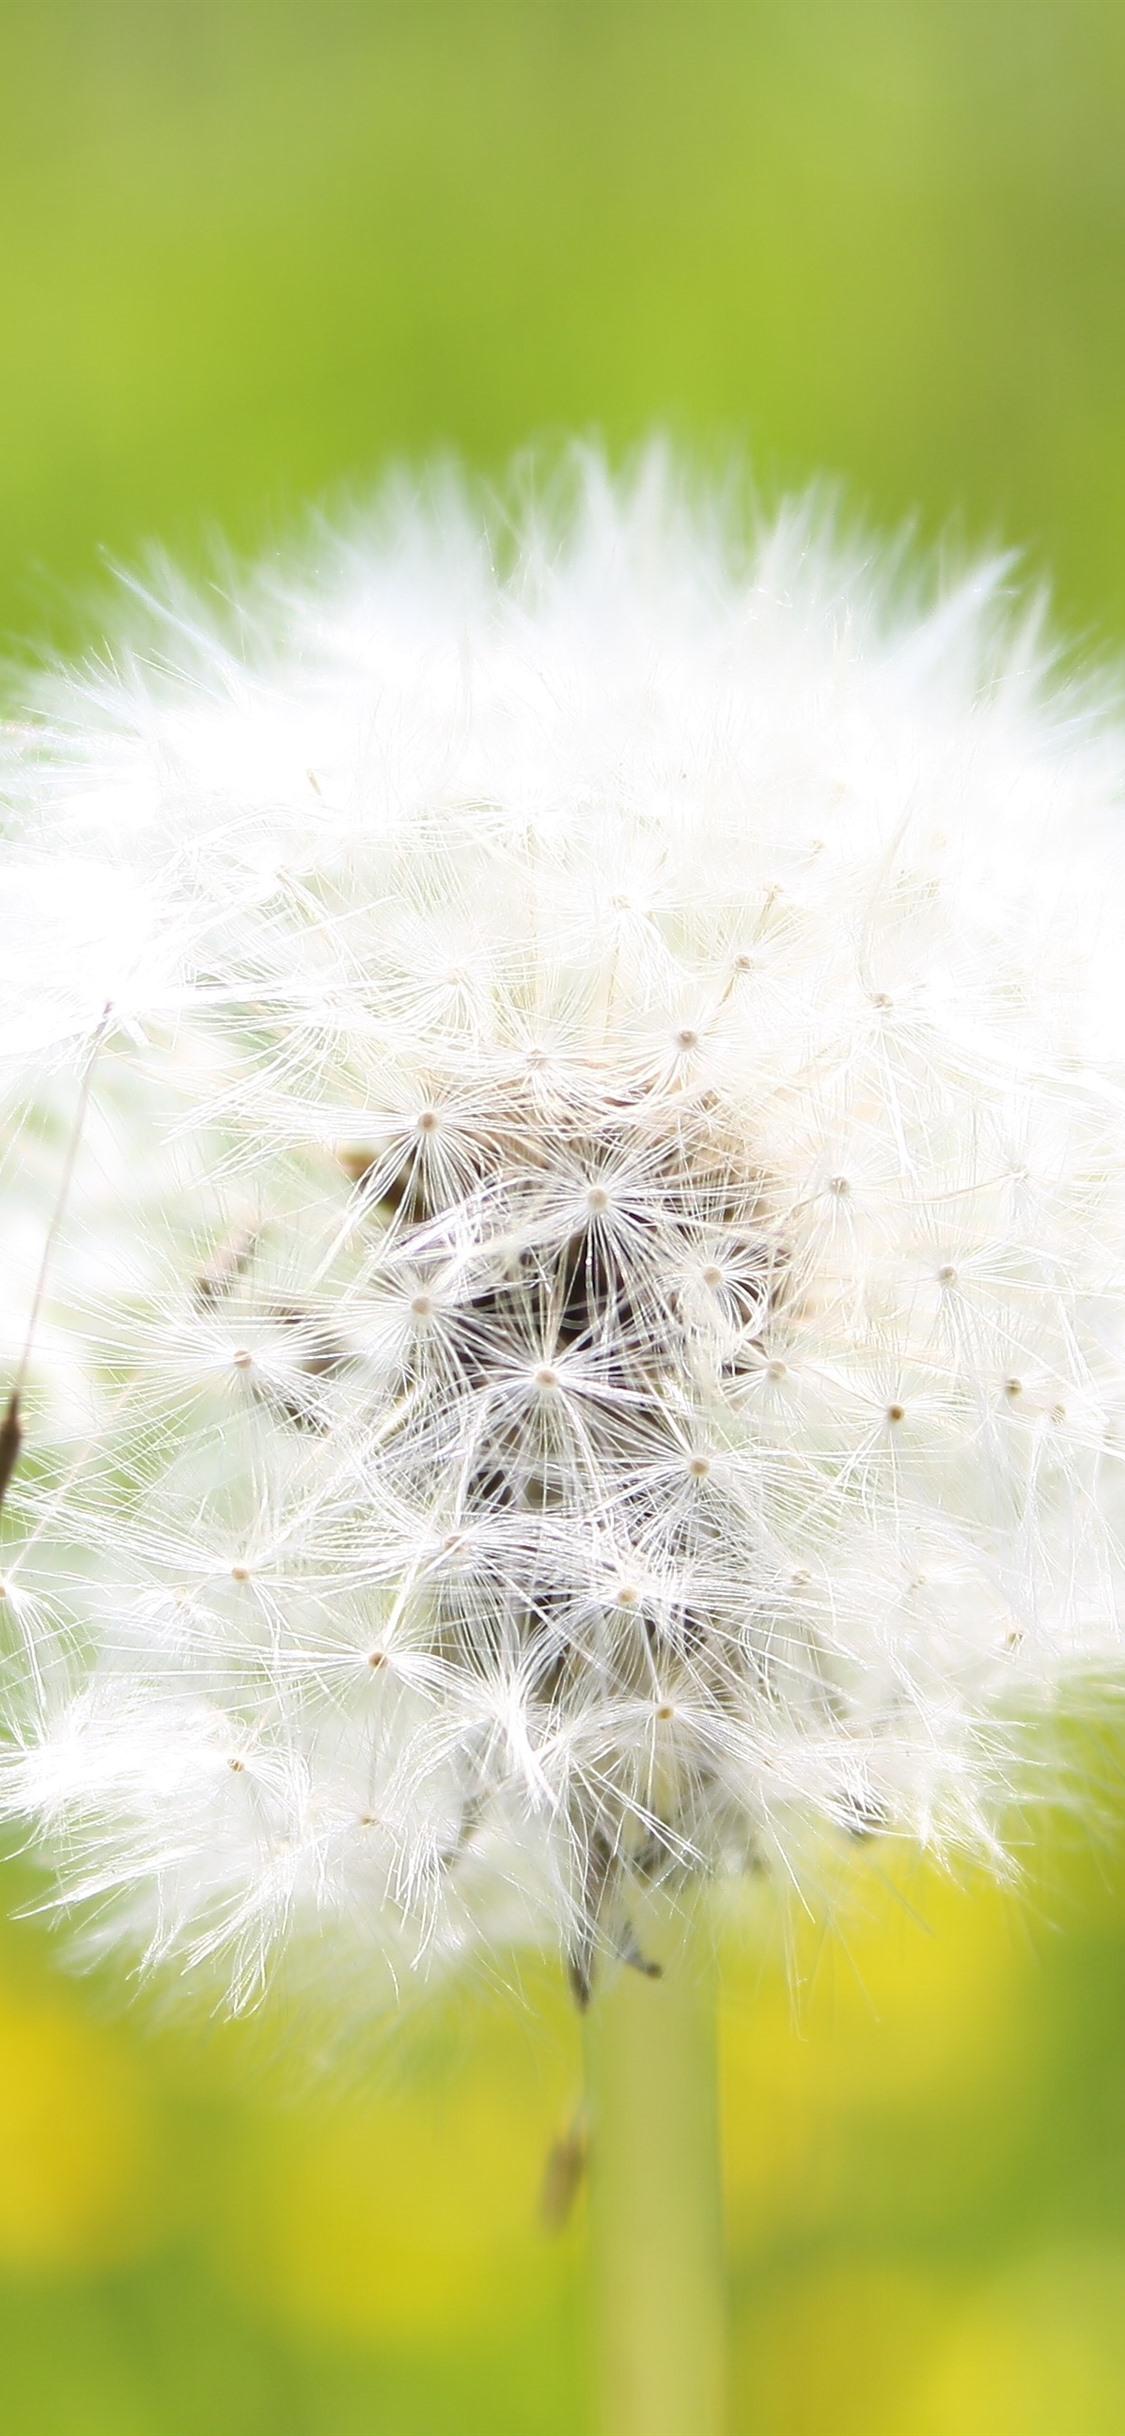 Dandelion White Flower Close Up Seeds Wind 1125x2436